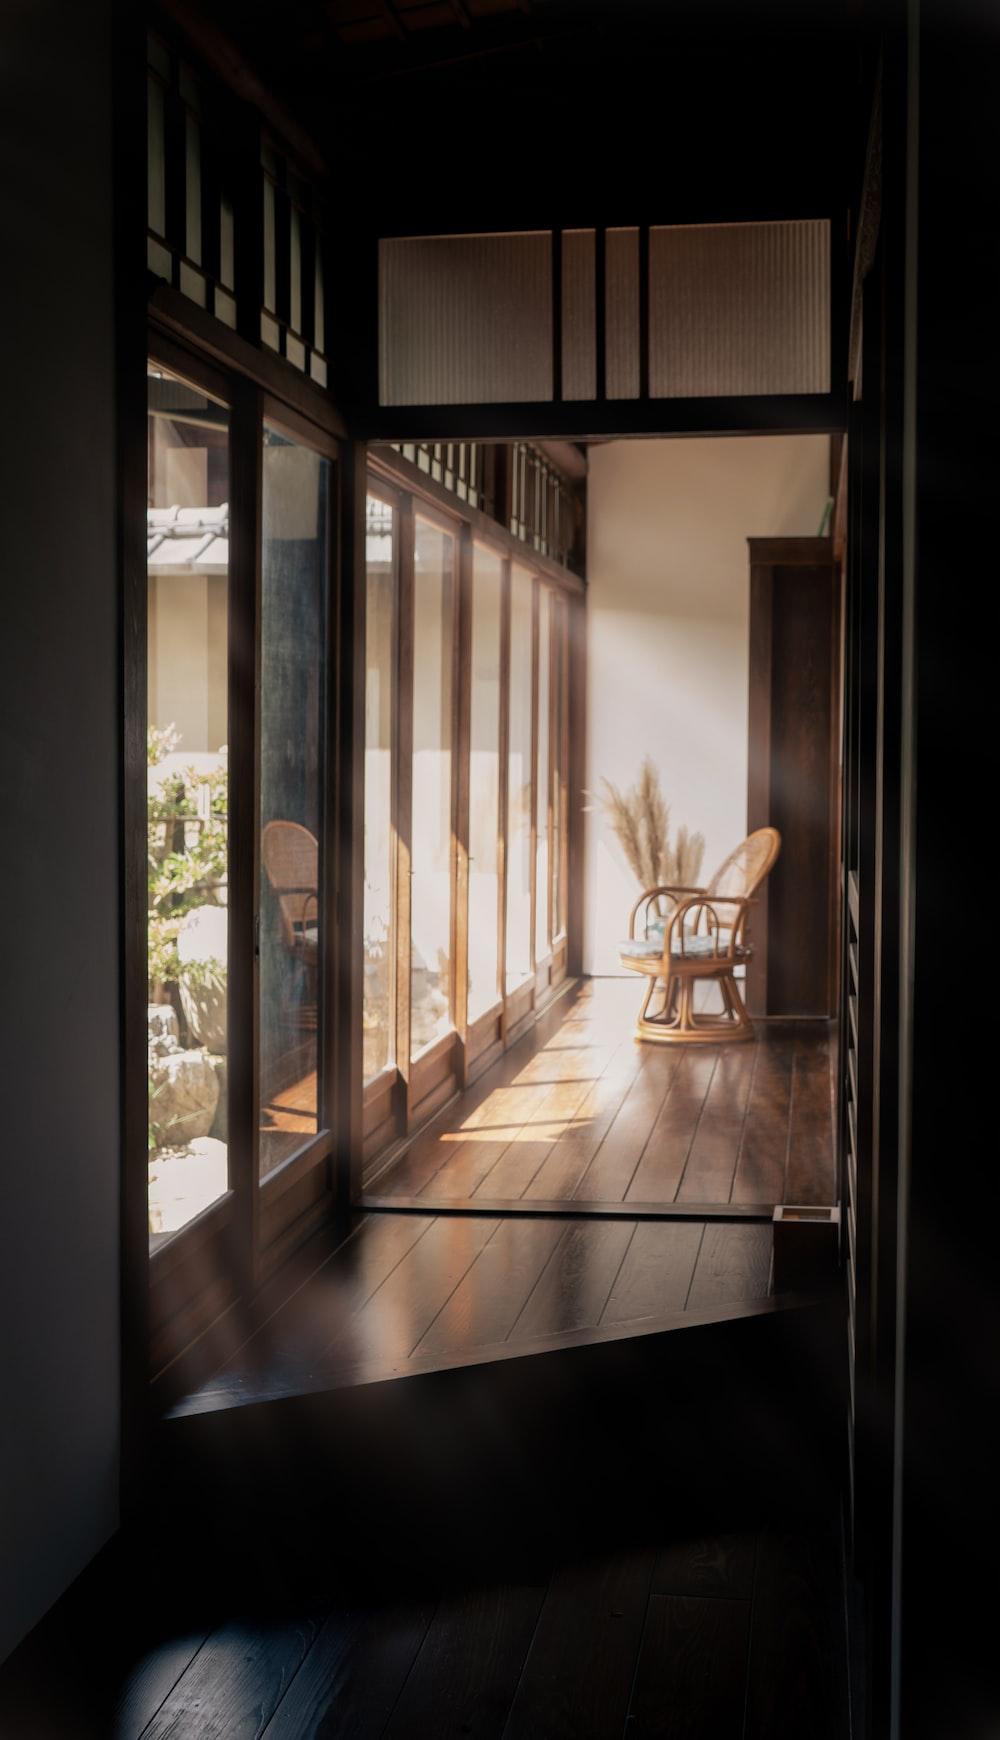 brown wooden chair near glass door